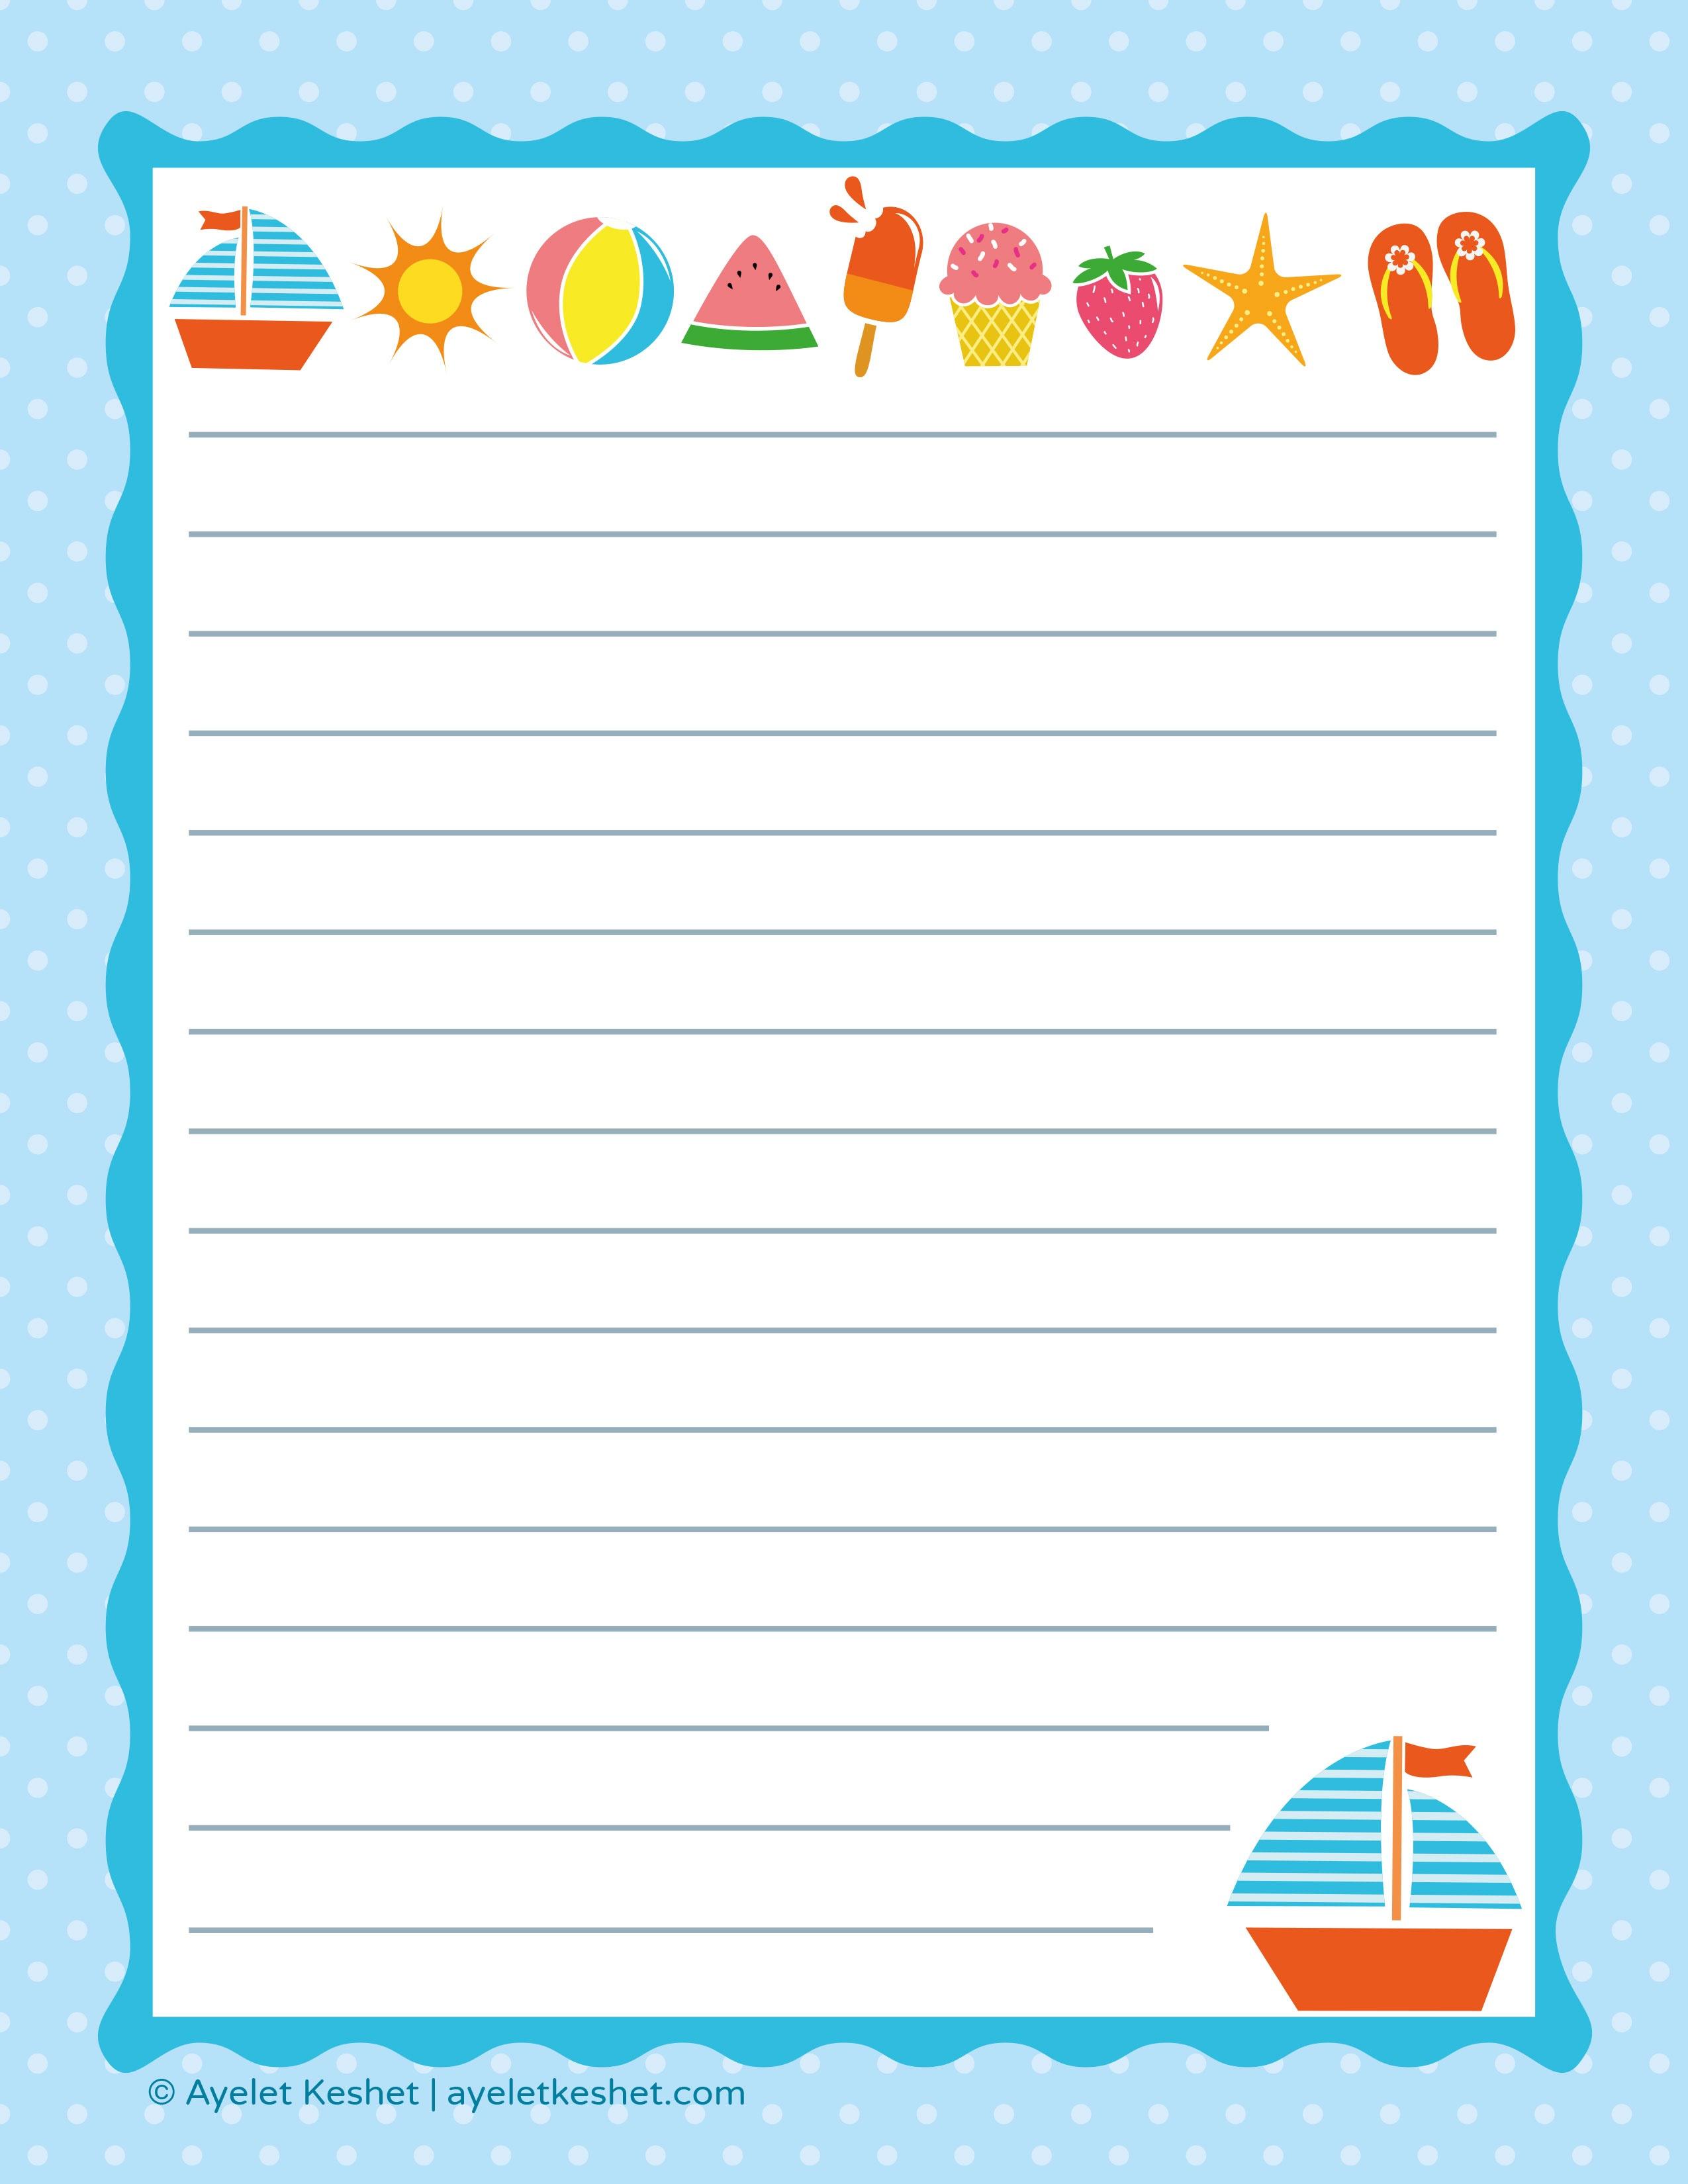 Free Printable Letter Paper - Ayelet Keshet - Free Printable Paper